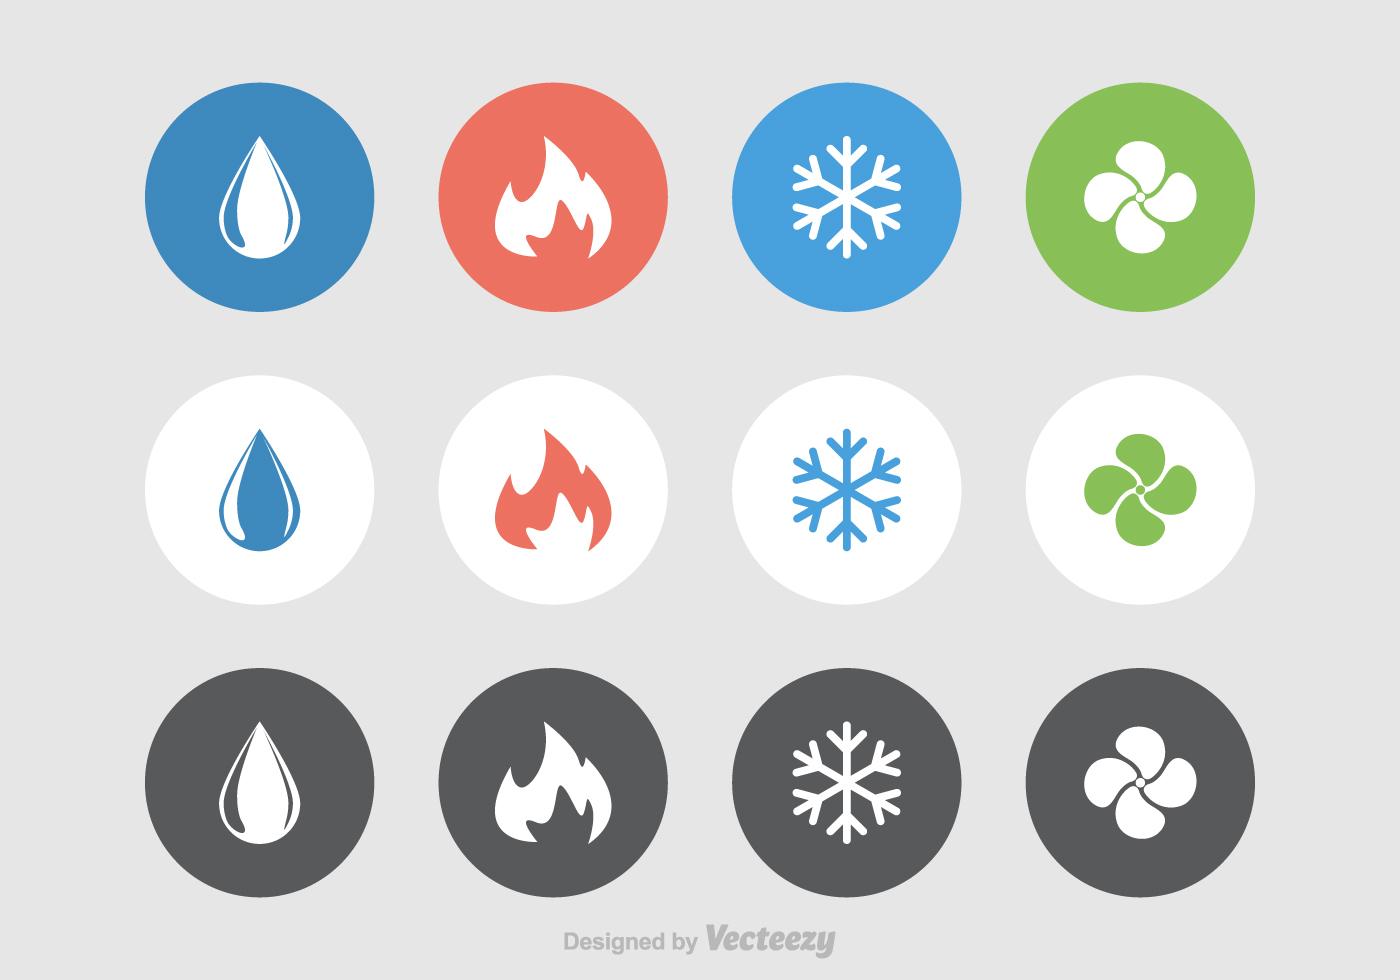 Hvac Free Vector Art 91 Downloads Drawing Symbols Icons